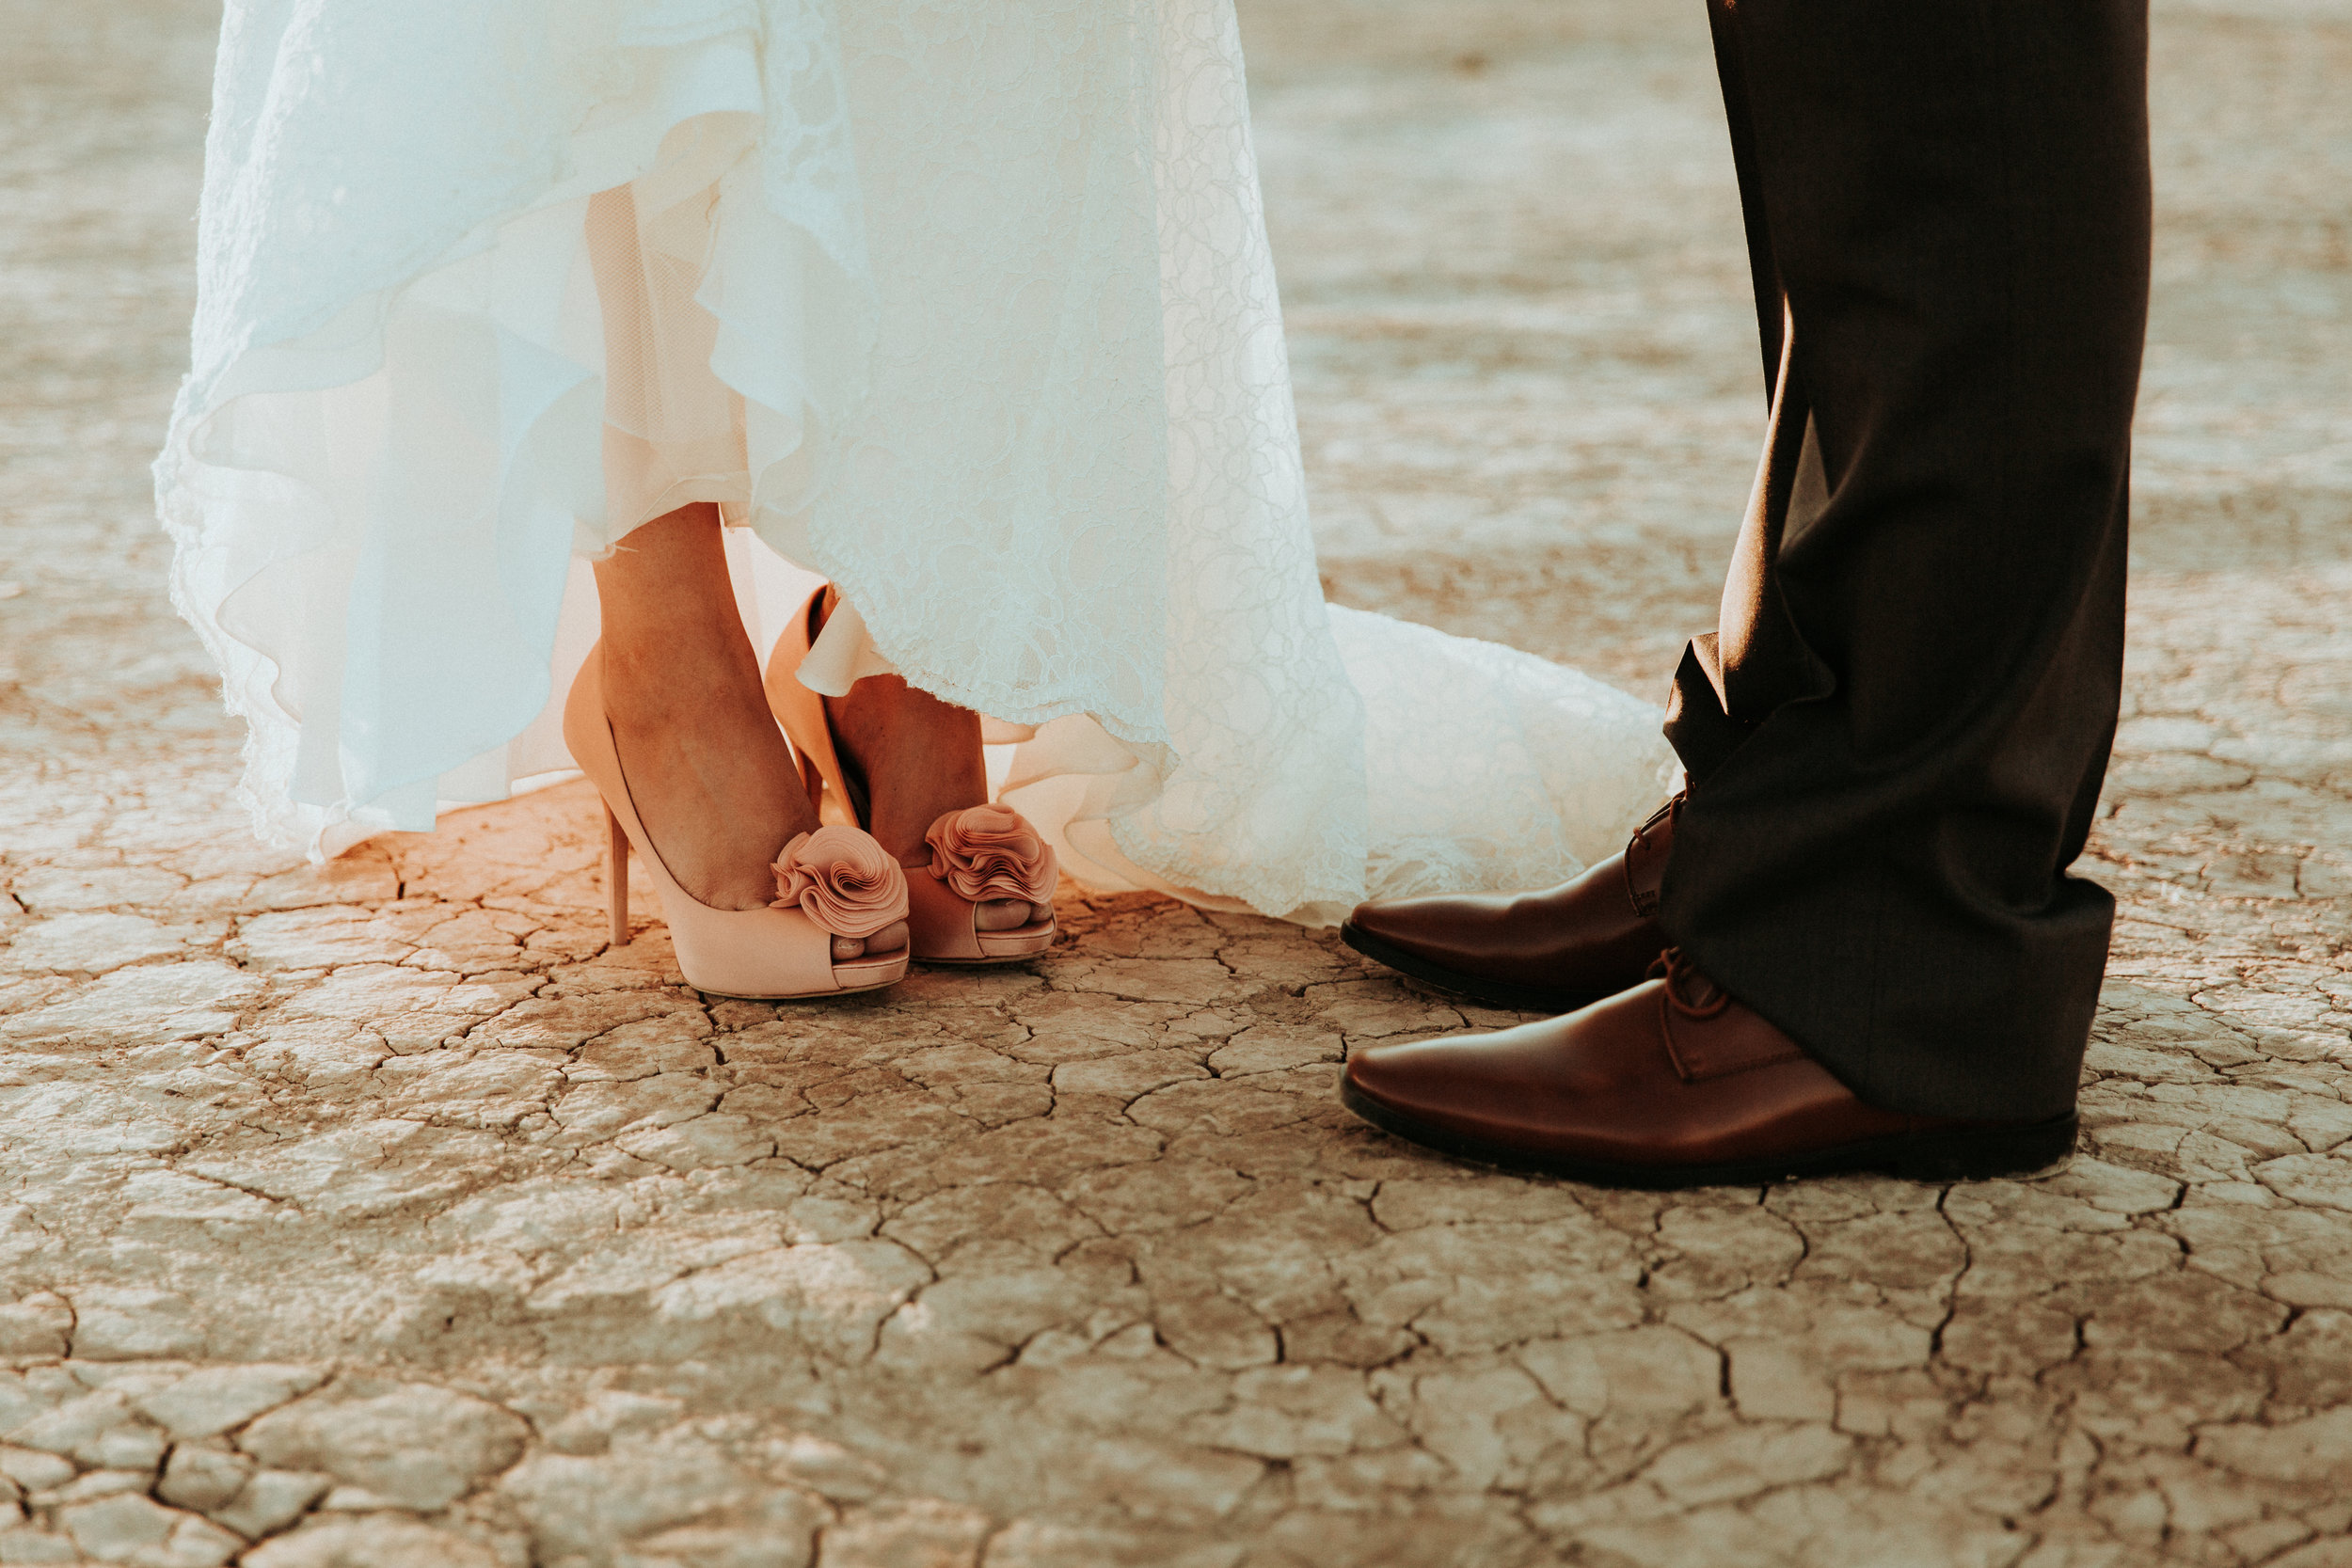 Las Vegas Wedding Photography - Seattle Wedding Photographer - PNW Wedding Photographer - Portland Elopement Photographer - PNW Wedding Photographer - Detail Shots - Bride and Groom - Beautiful Wedding - Wedding Shoes - Dry Lake Bed